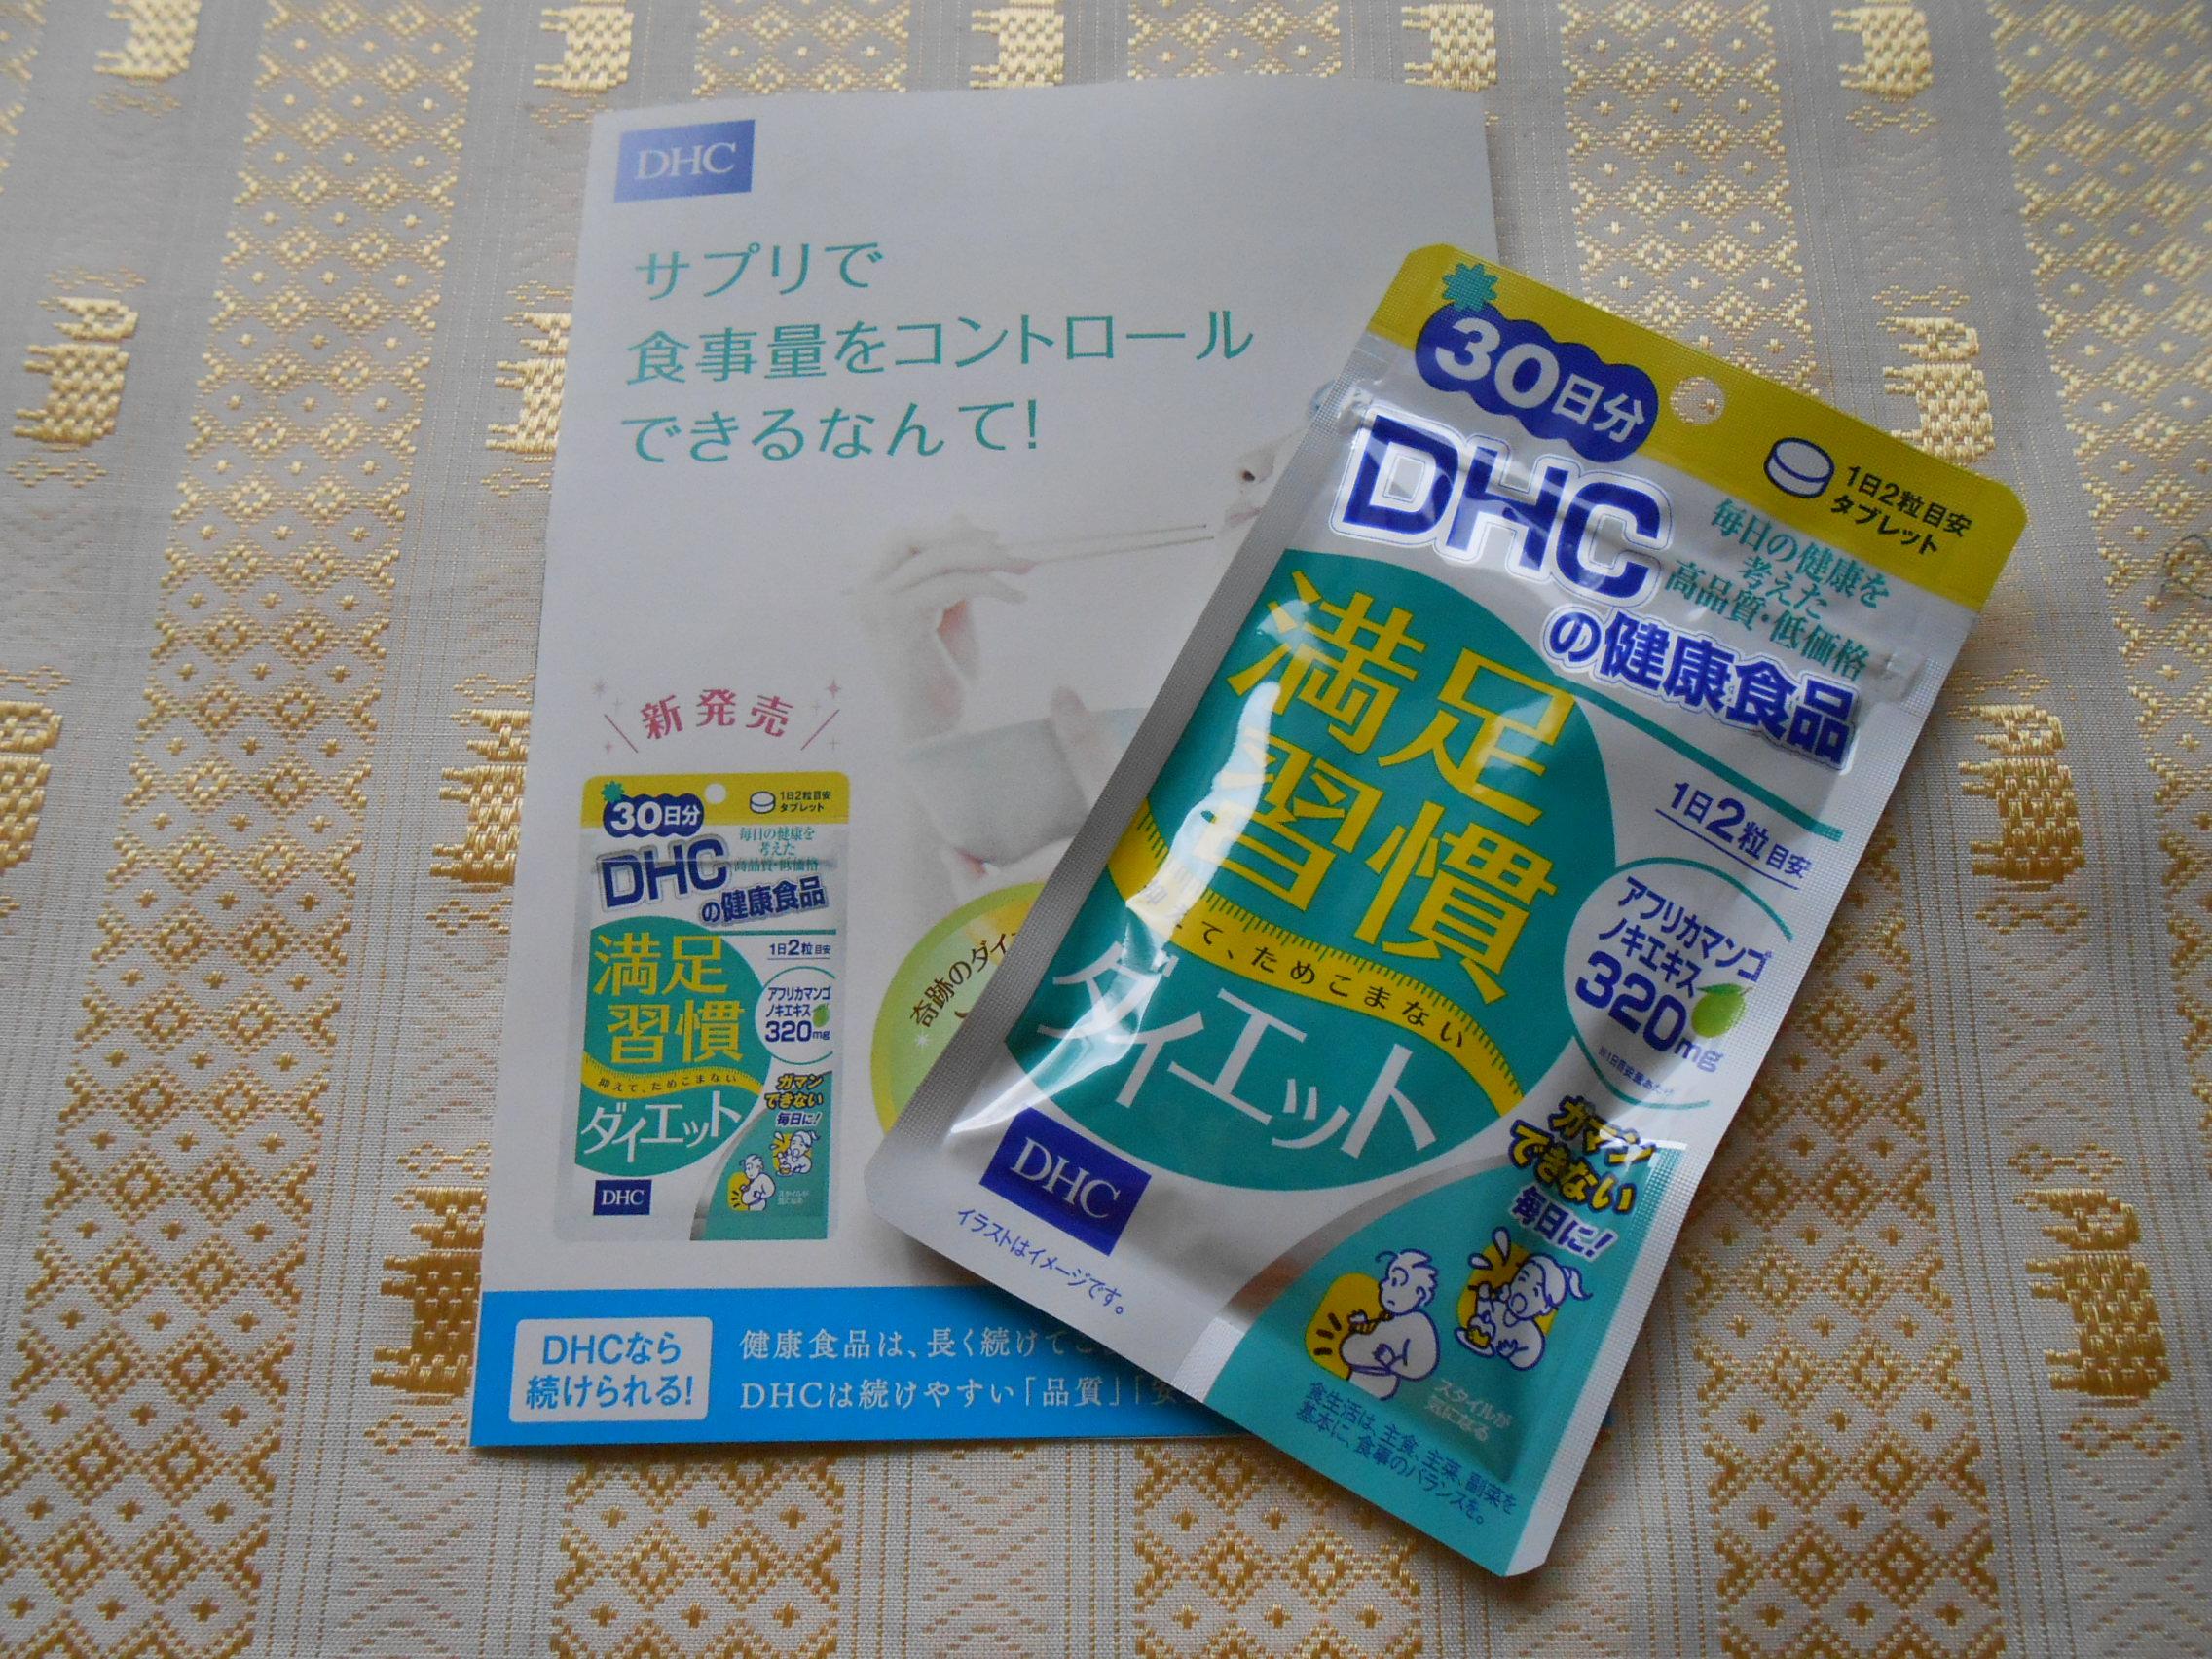 DSCN9829_2015011218474874a.jpg